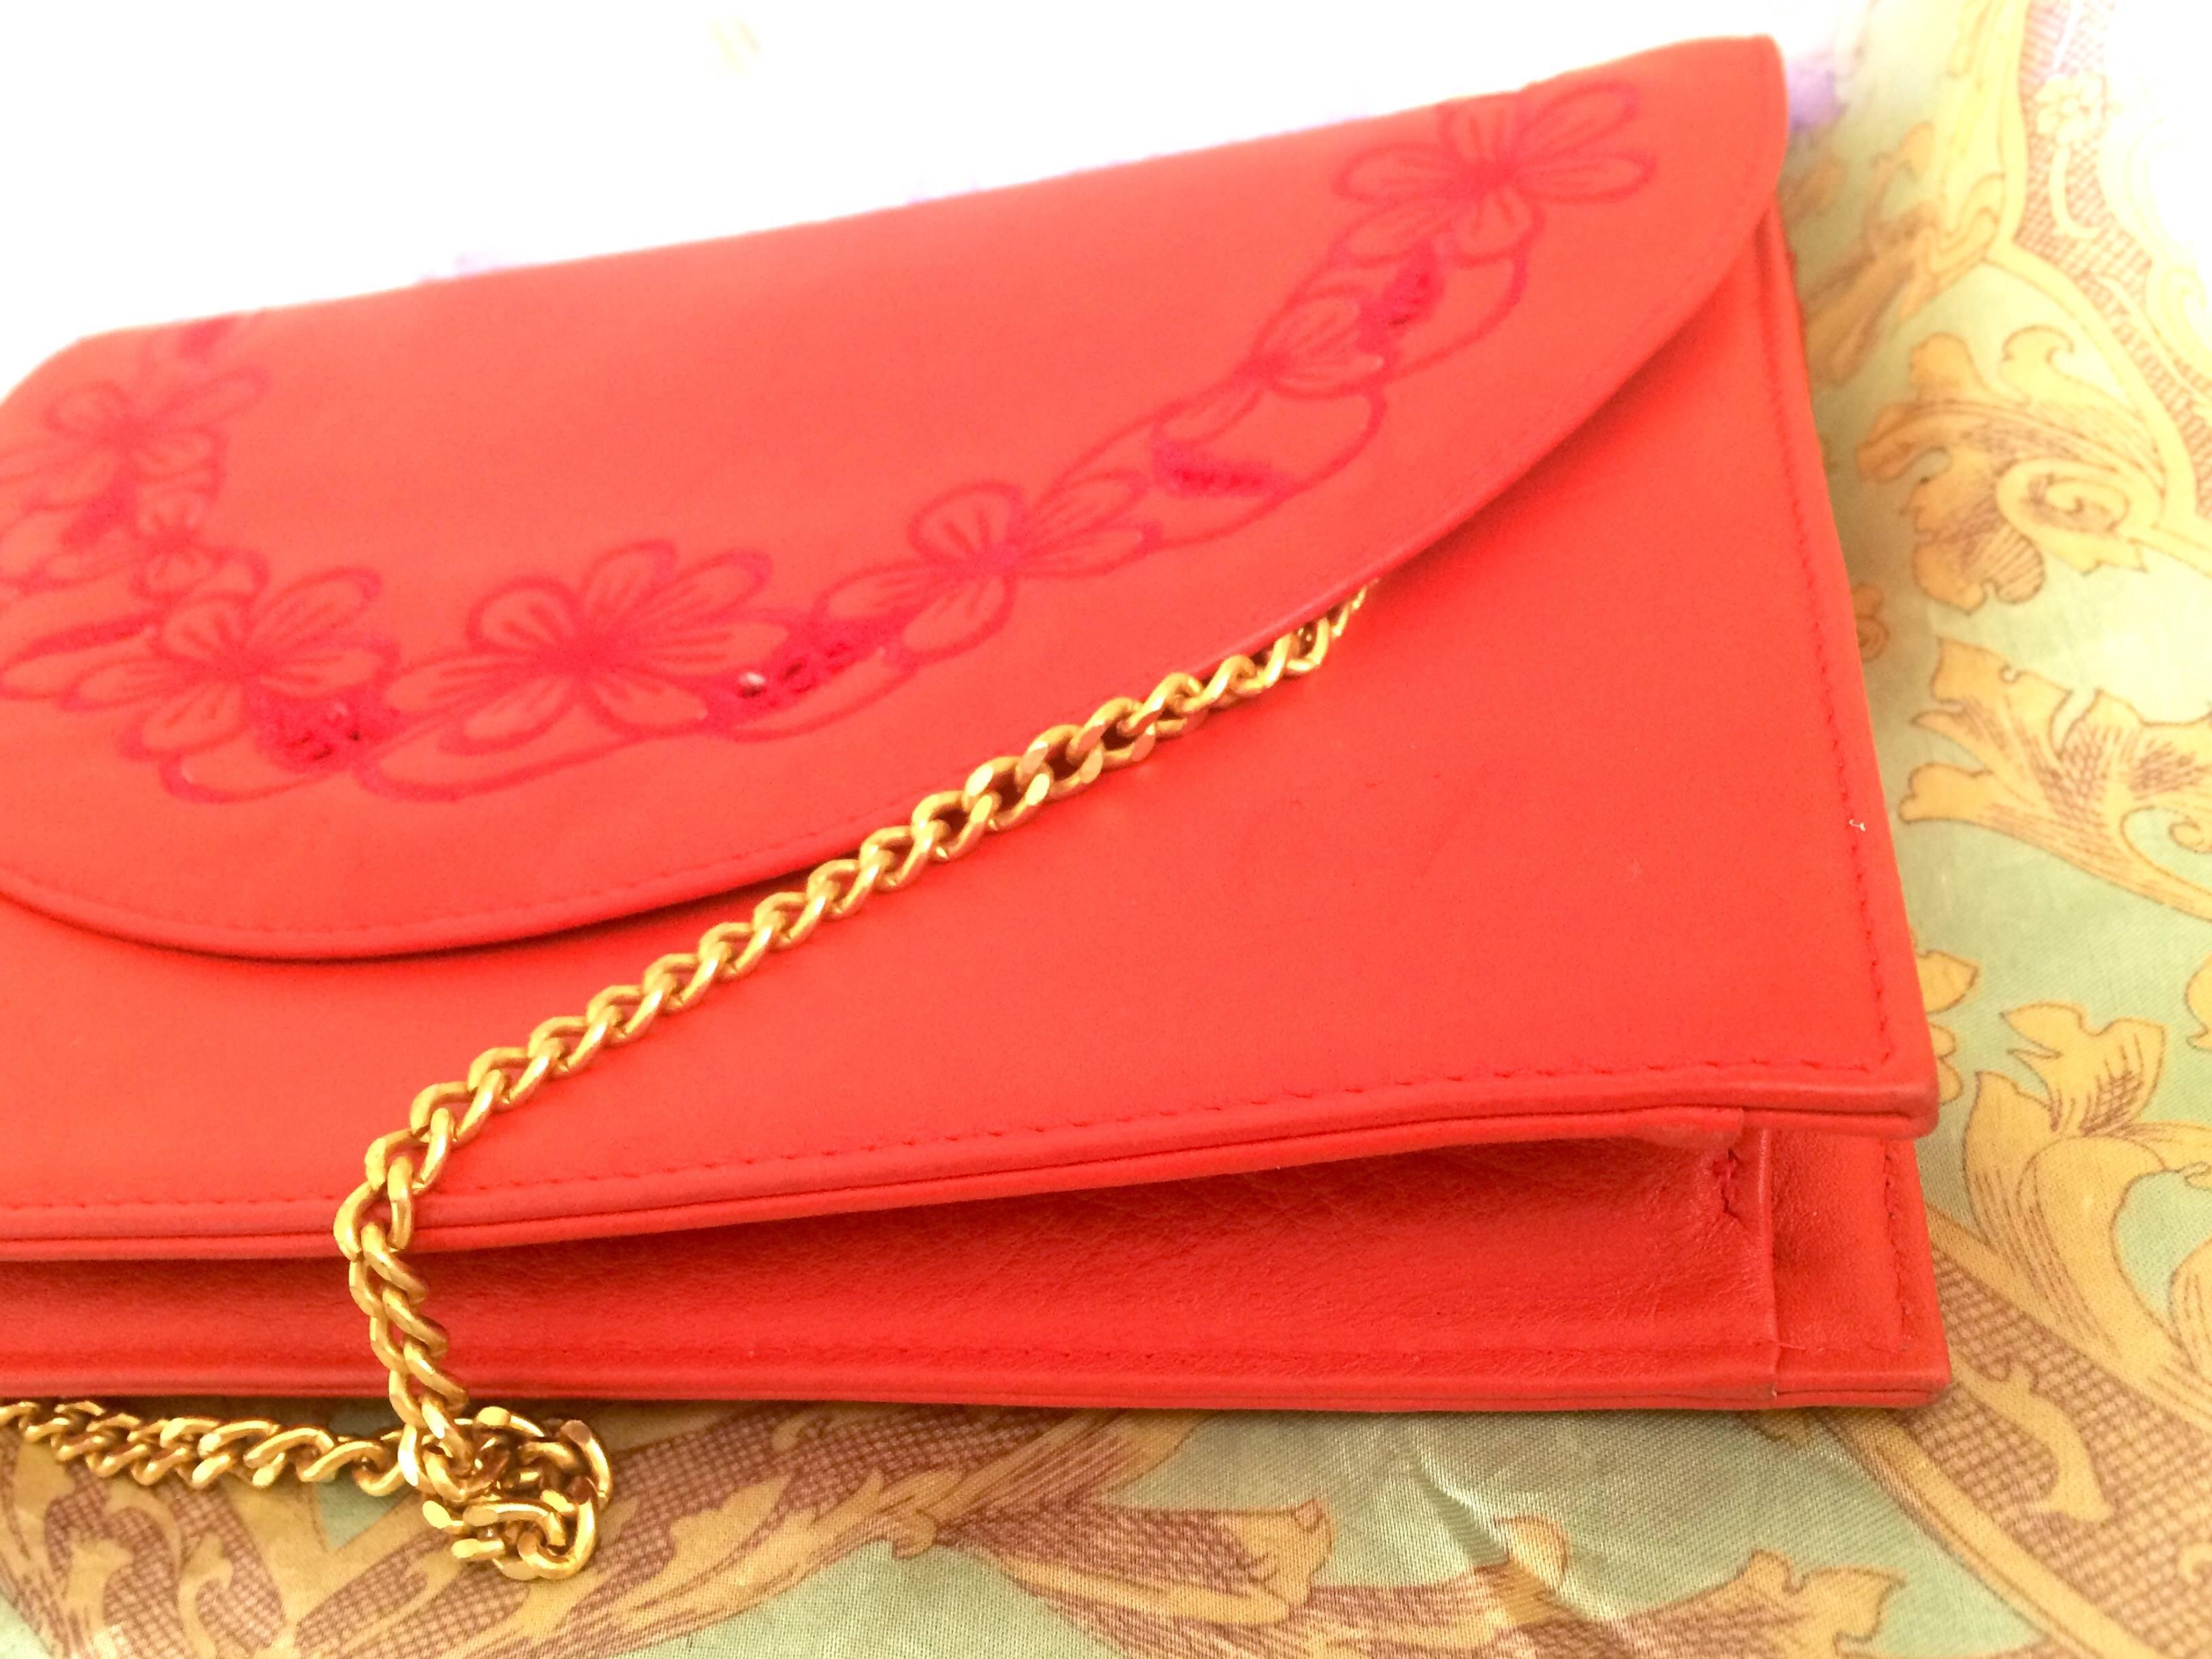 Valentino Vintage Valentino Garavani Red Clutch Shoulder Bag With Flower Embroidery Deco fGJ5H1uQeh